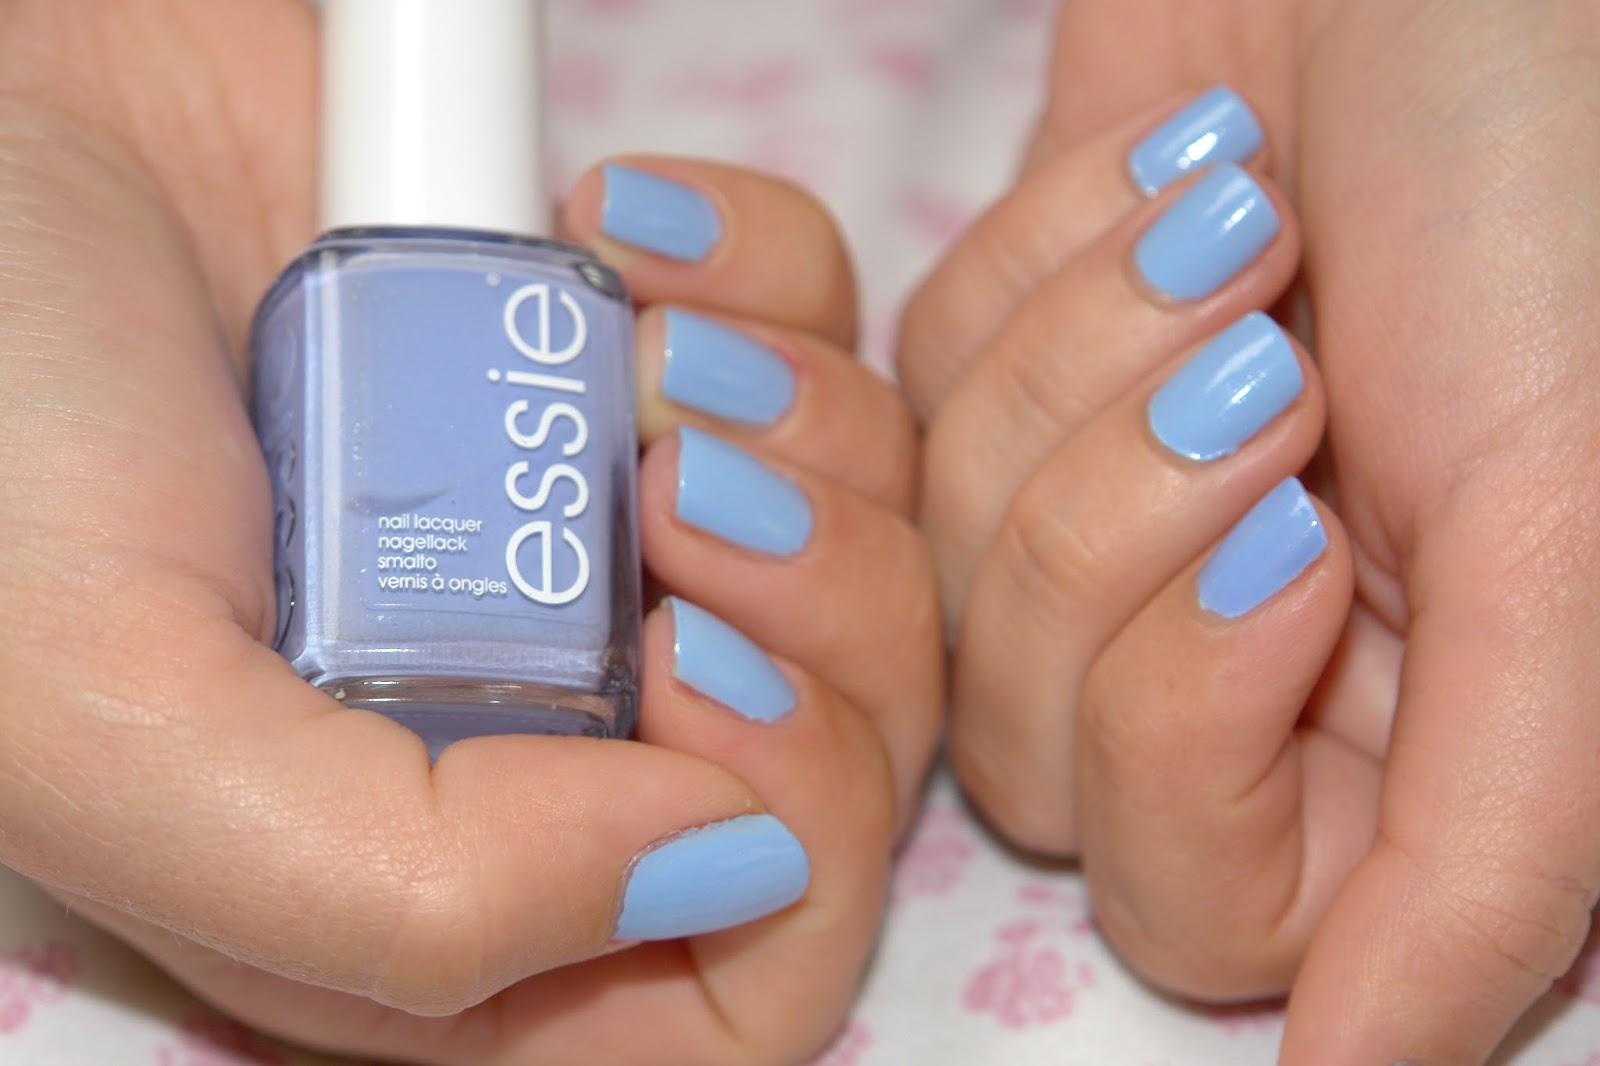 NAILS: Essie Bikini So Teeny, Essie, nail polish, nails, NOTD, blue, swatch, swatches, bbloggers, beauty UK blog